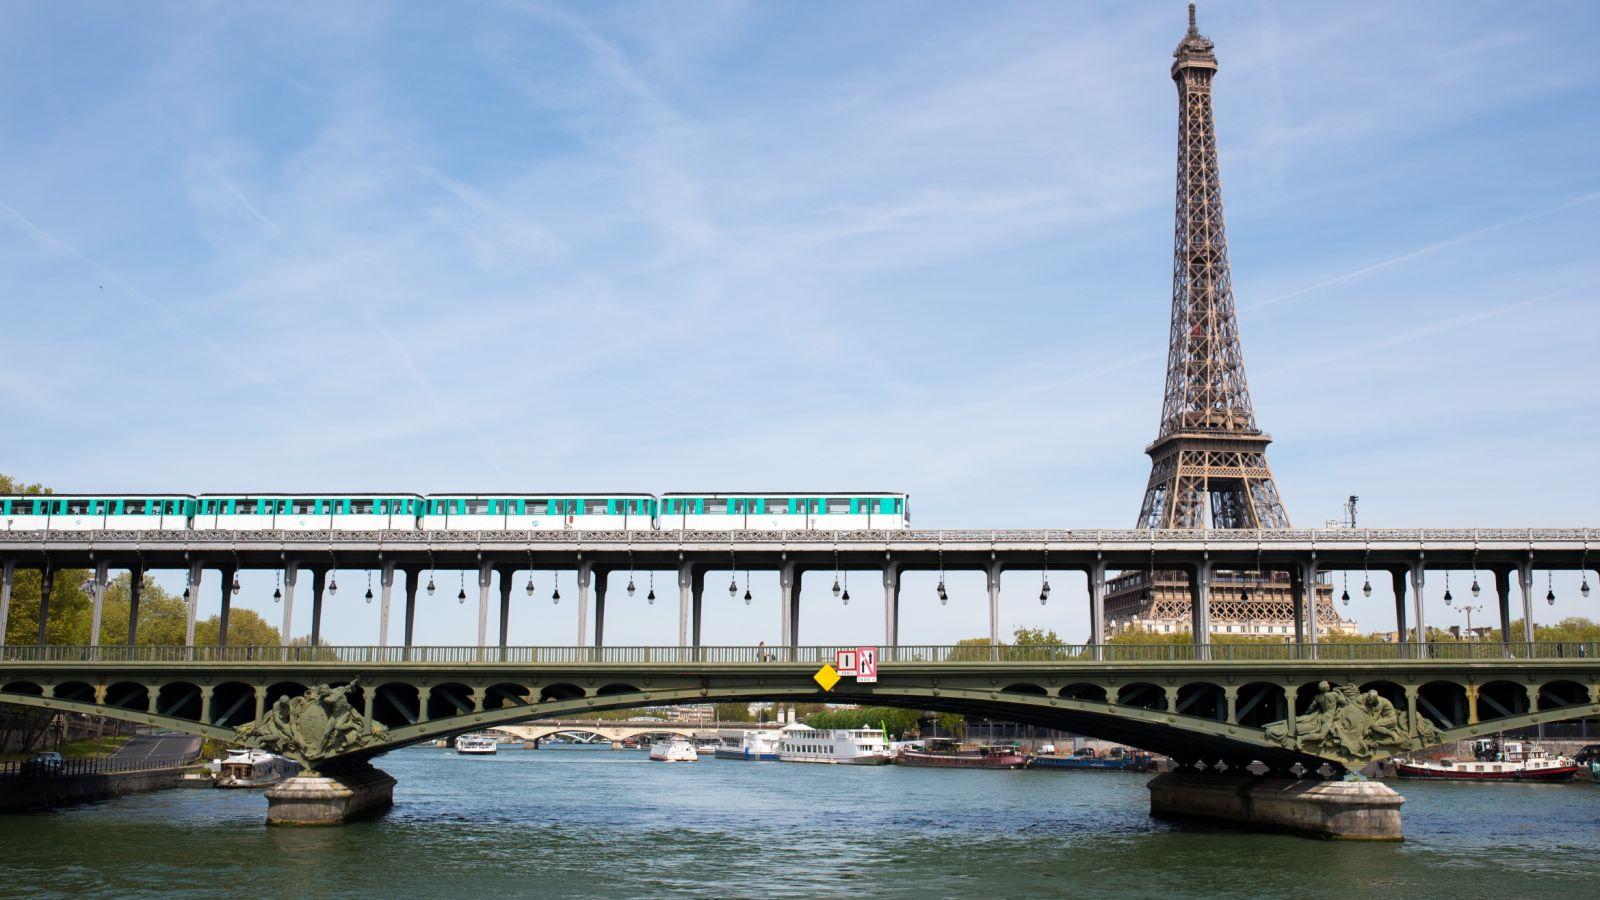 kinh nghiem du lịch paris 6 elle man